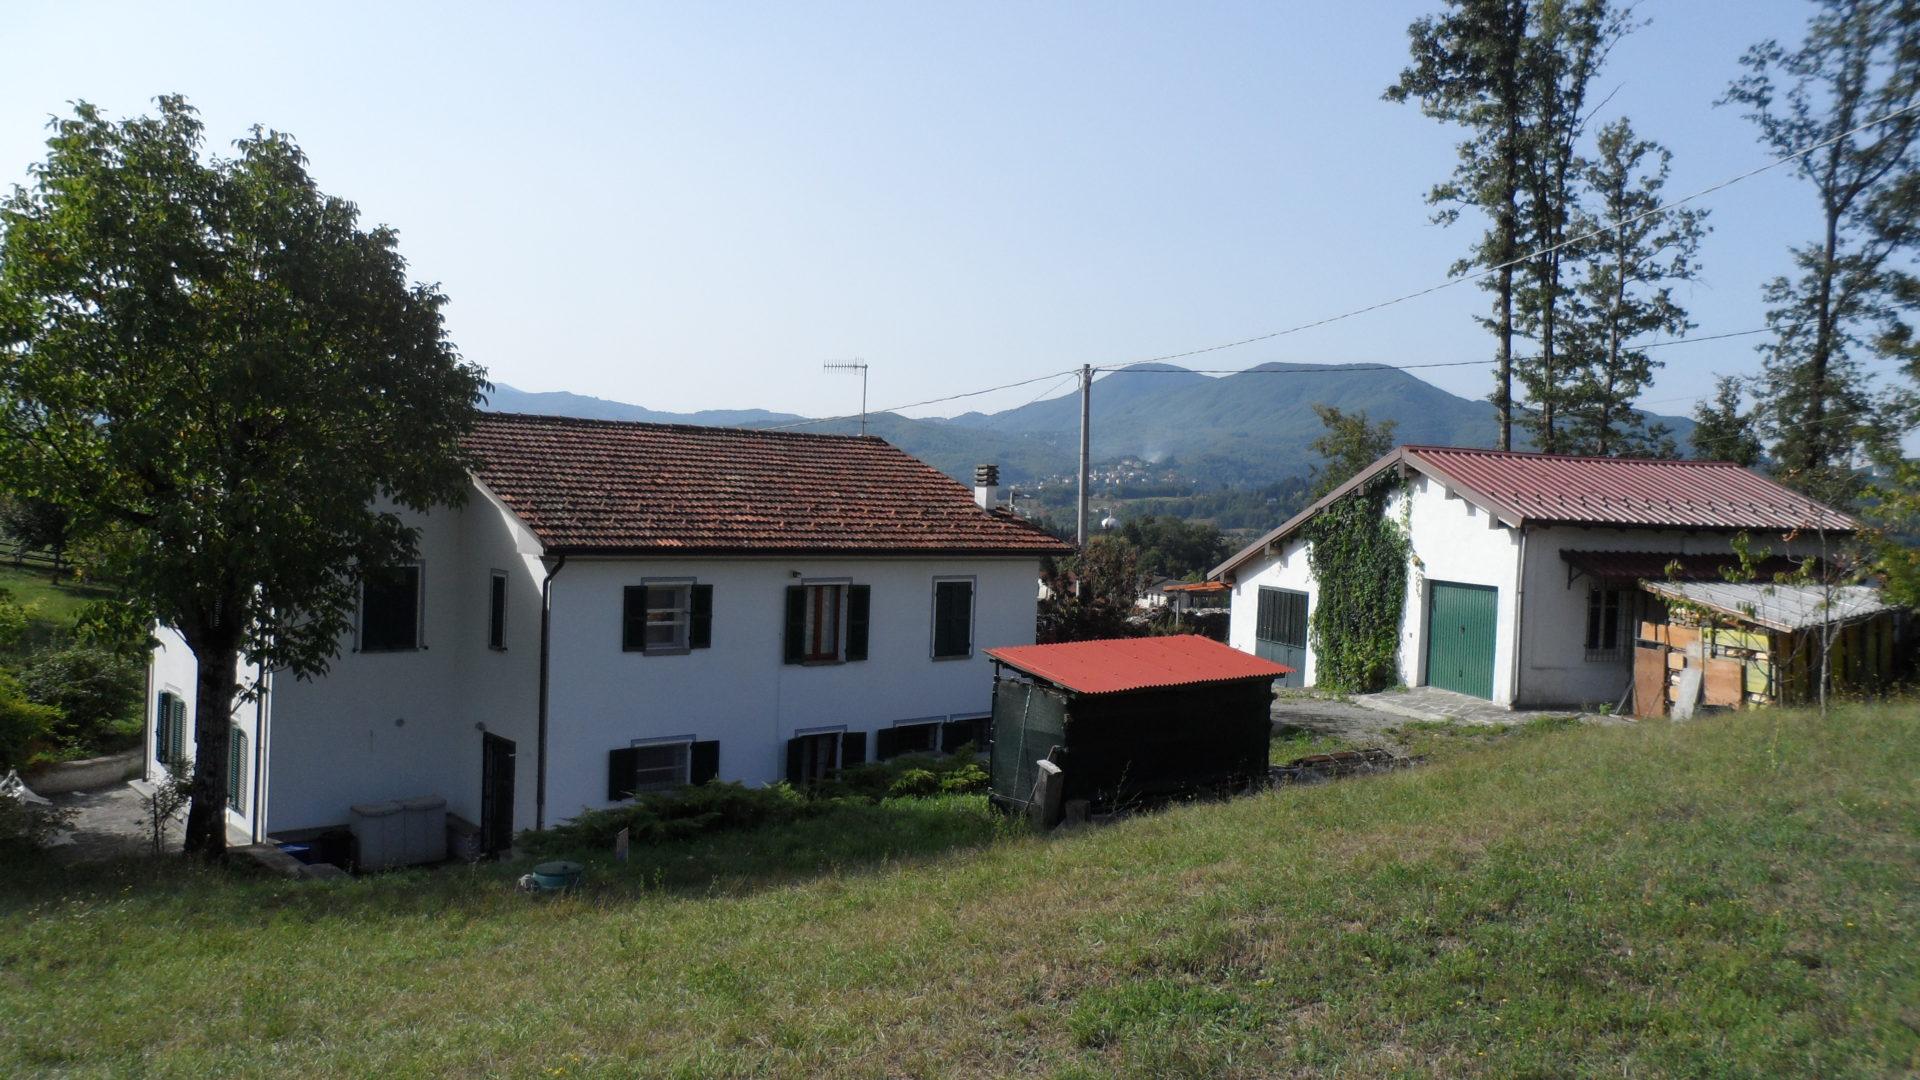 Casa con terreno bedonia a557 alessandrini casa - Casa con terreno murcia ...